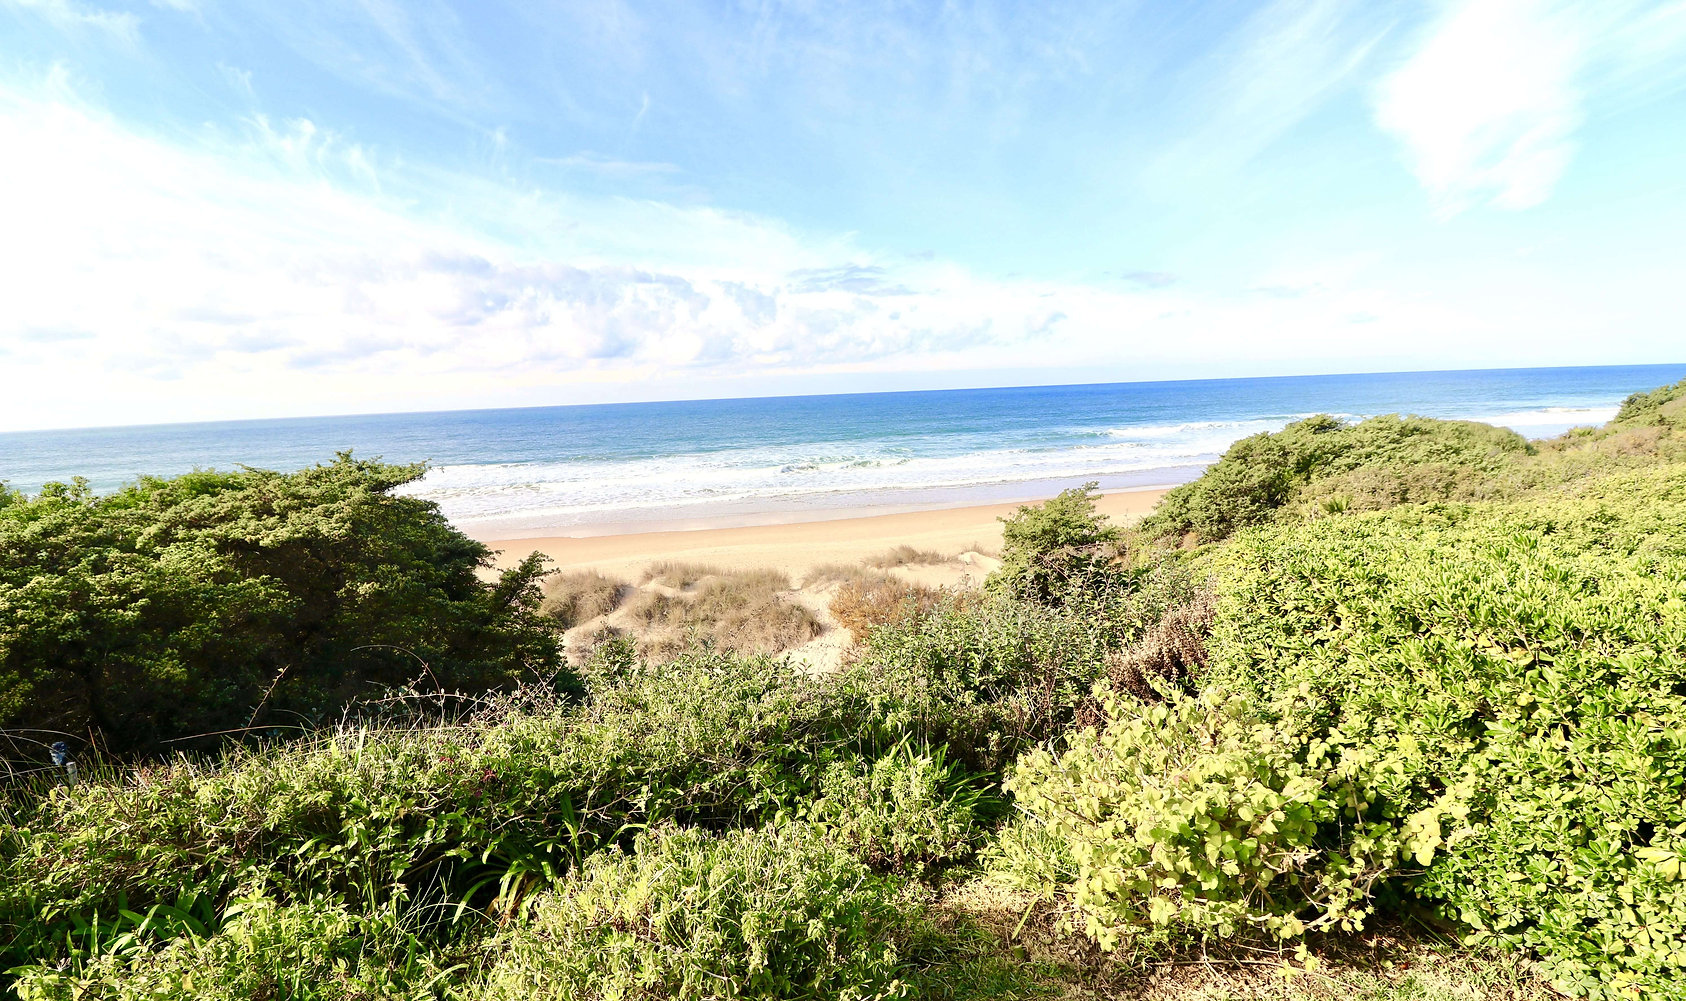 beach-roche-atlantic-ocean-refv41.jpeg